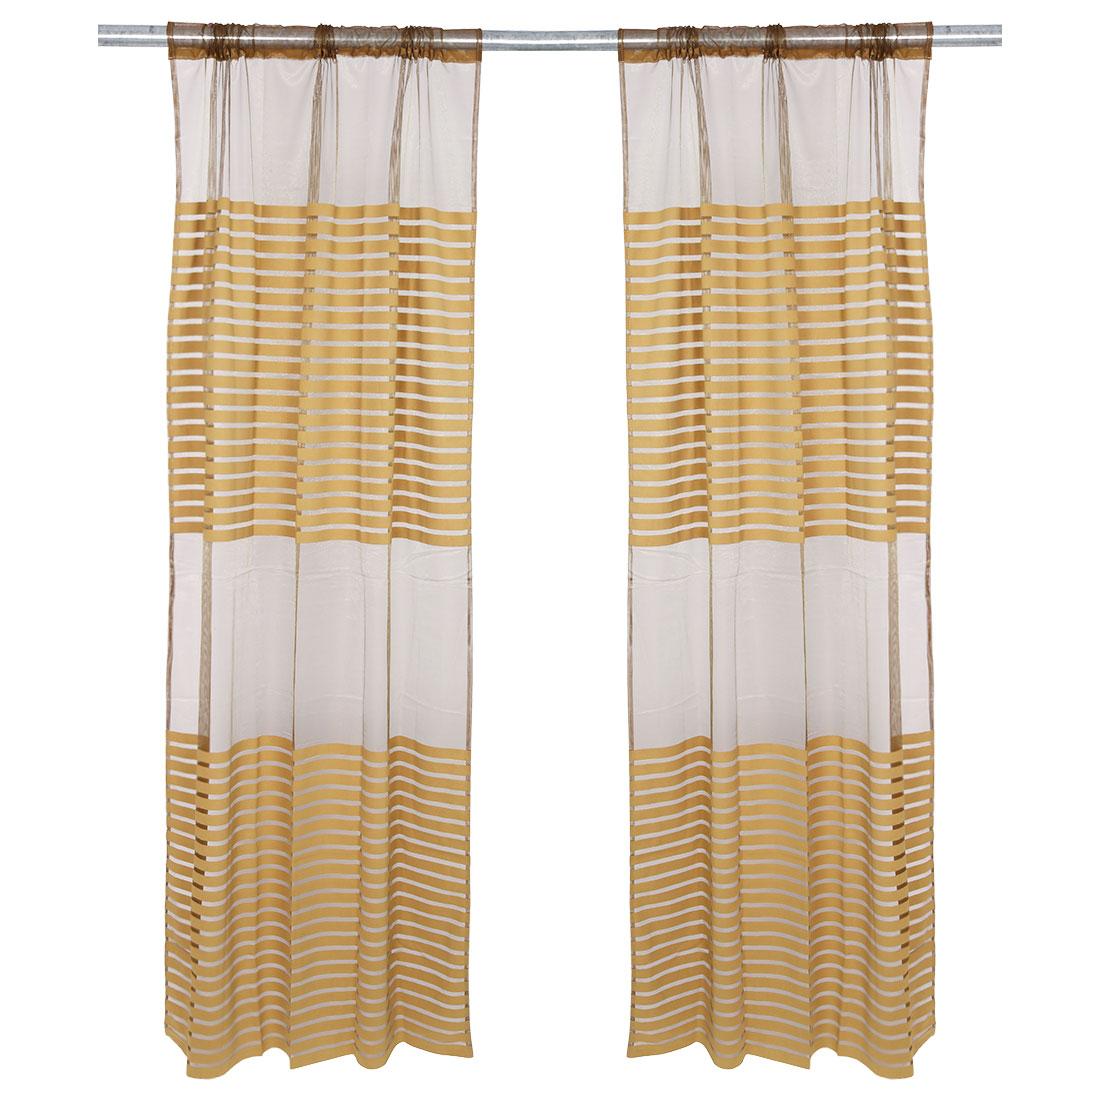 Bedroom Stripe Pattern Decorative Panel Window Sheer Curtain Brown 100 x 200cm